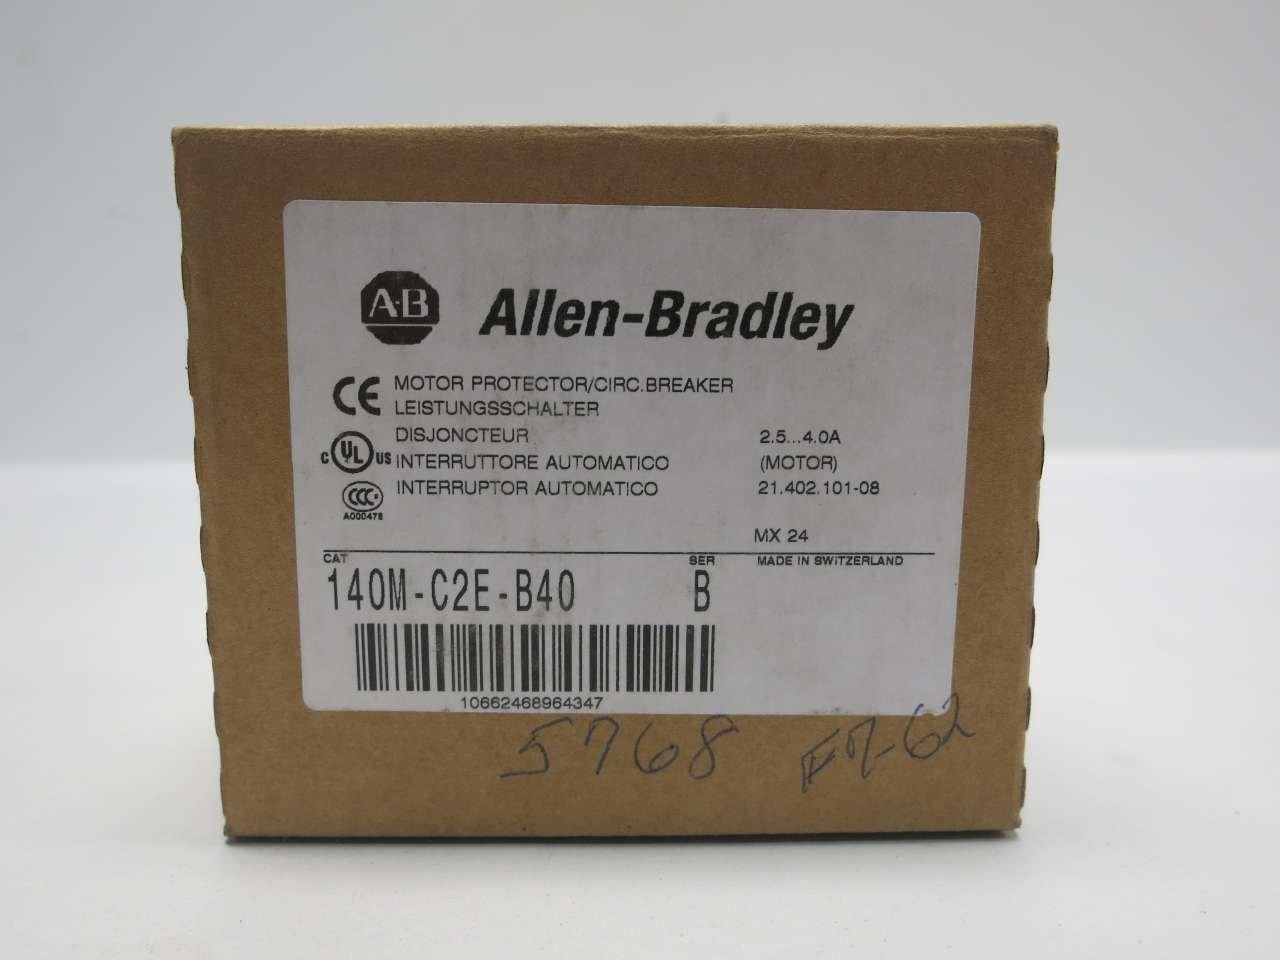 NEW ALLEN BRADLEY 140M-C2E-B40 SER B 3HP 2.5-4A AMP MANUAL MOTOR STARTER D512285 by Allen-Bradley (Image #7)